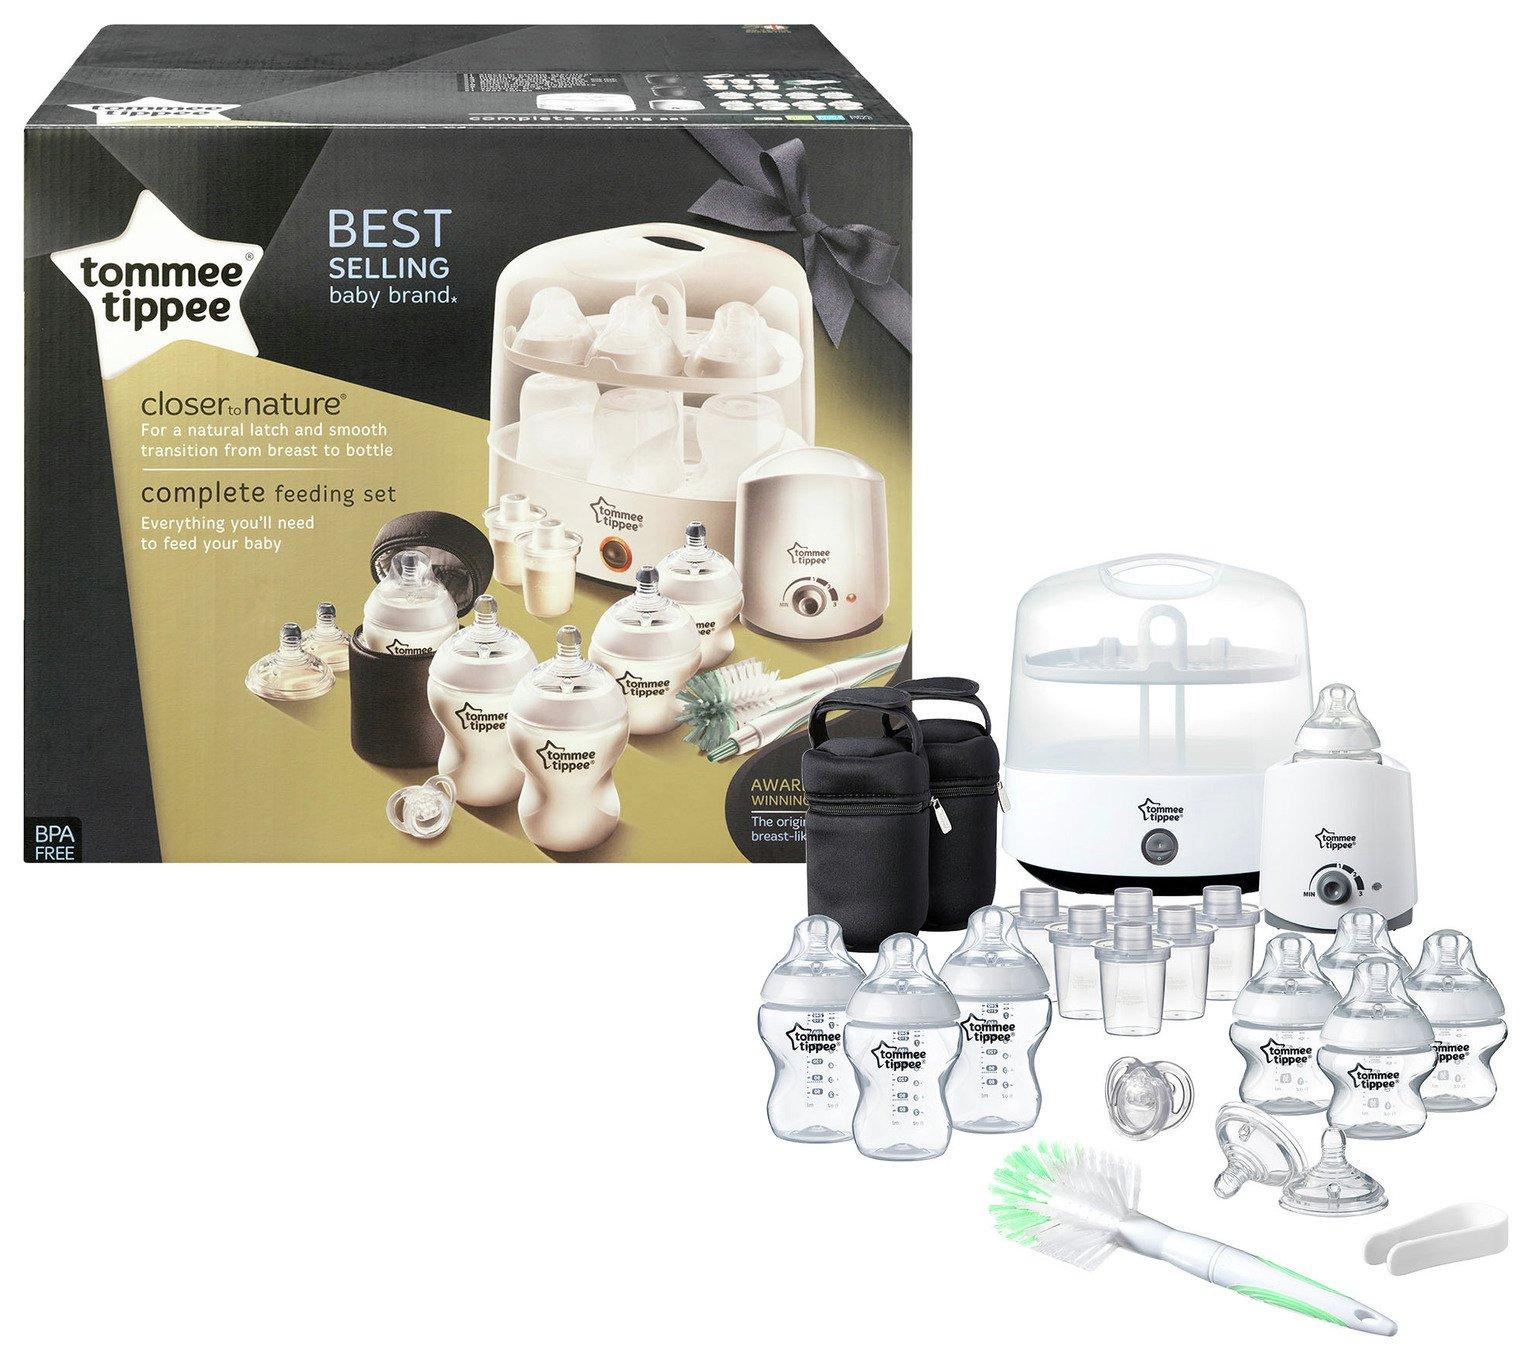 Tommee Tippee - Essentials Starter Kit